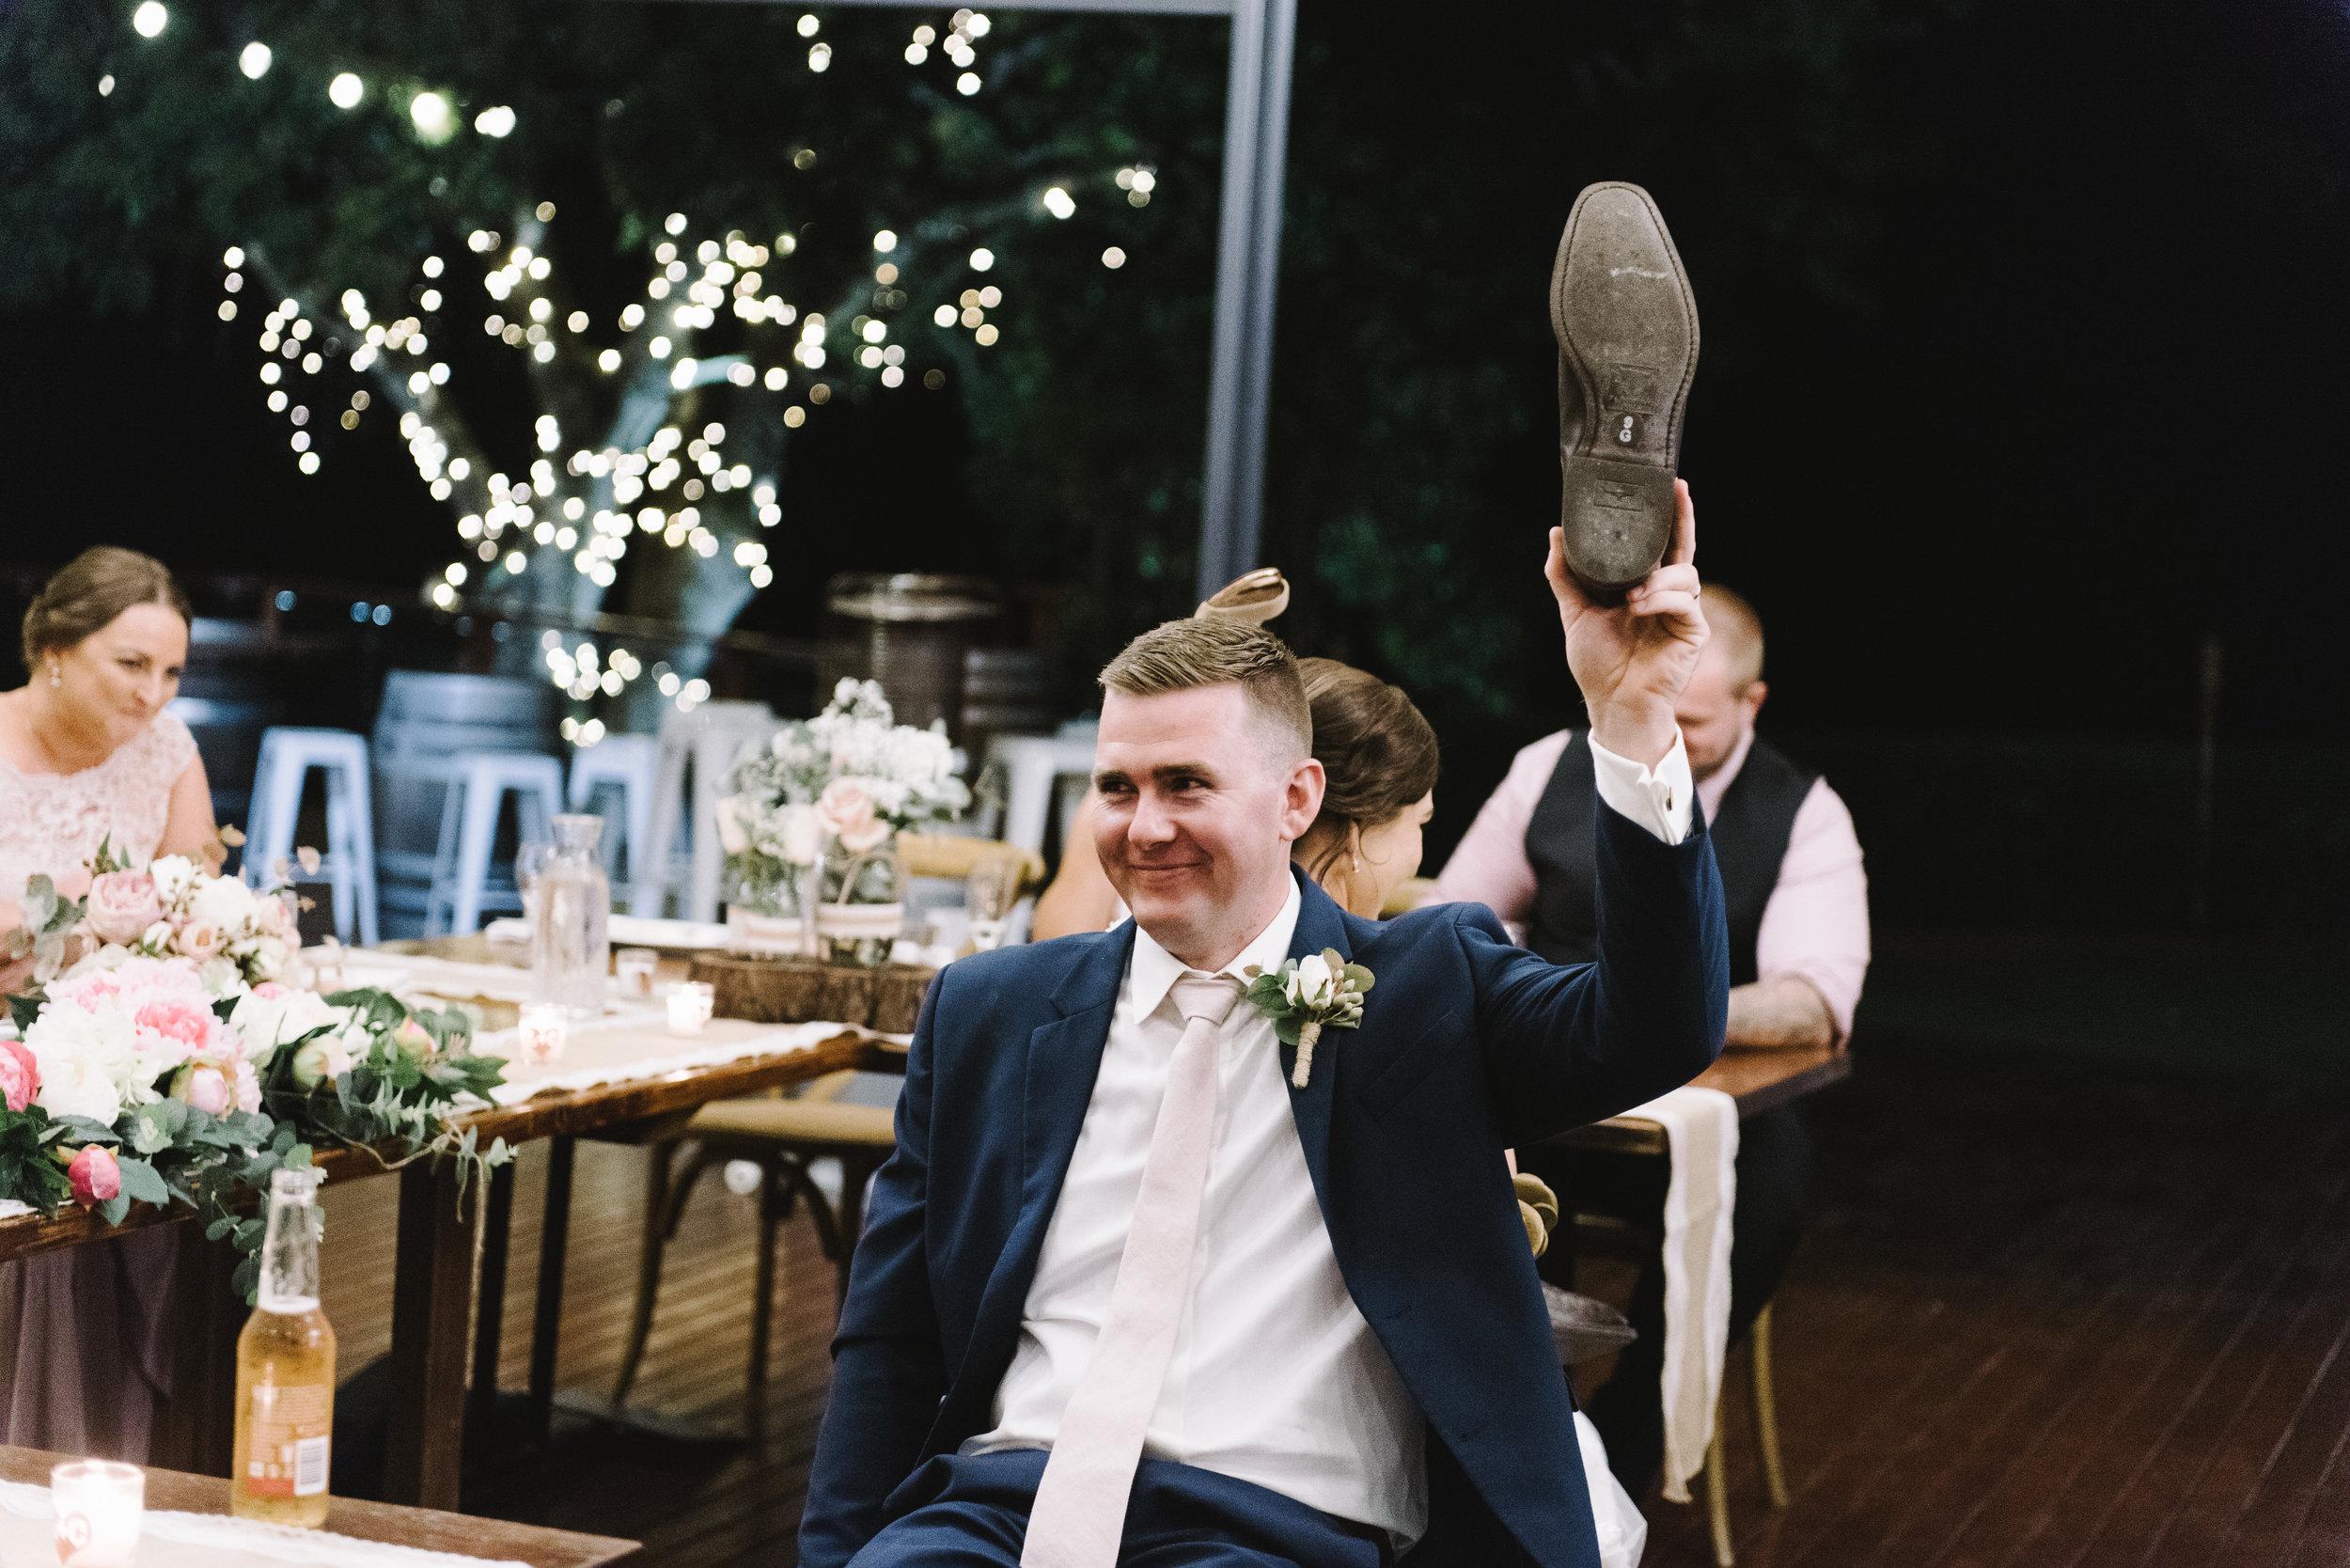 LAURENOLIVIA-austinvilla-estate-wedding-97.jpg